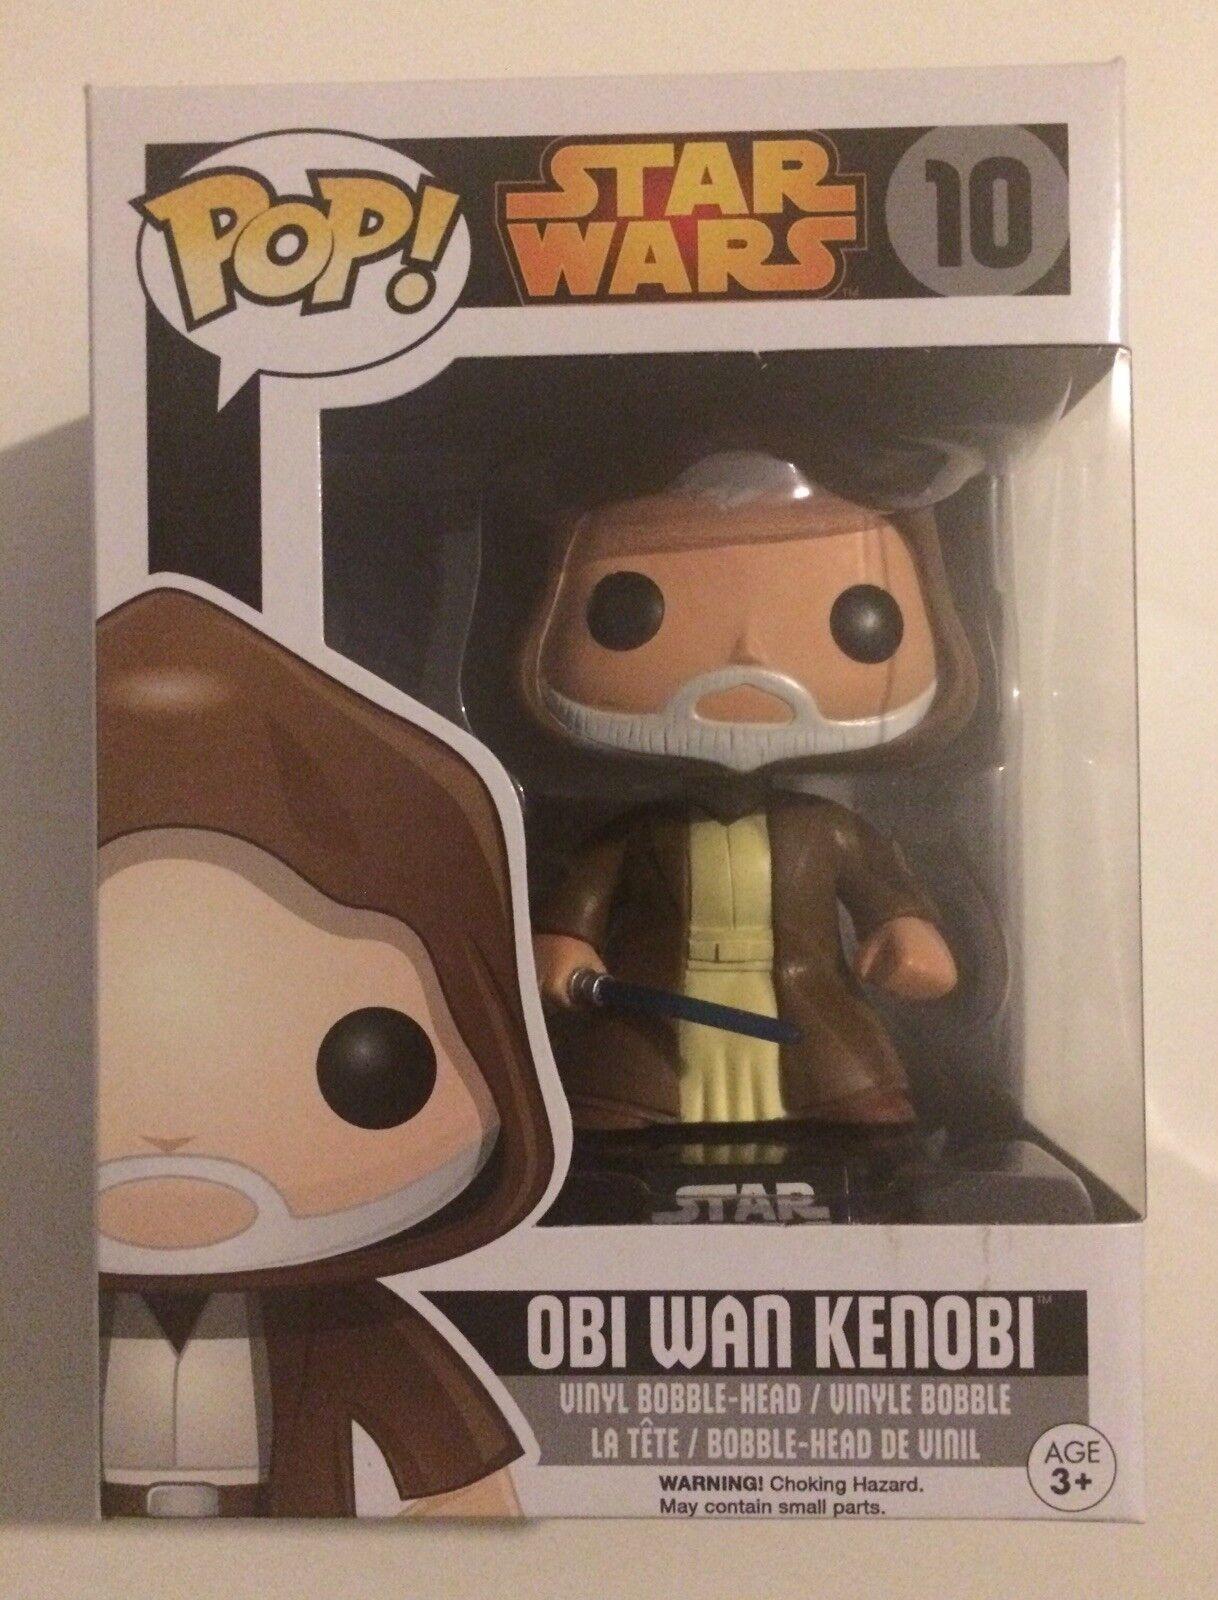 Obi - wan kenobi funko pop - star - wars - selten in bild.